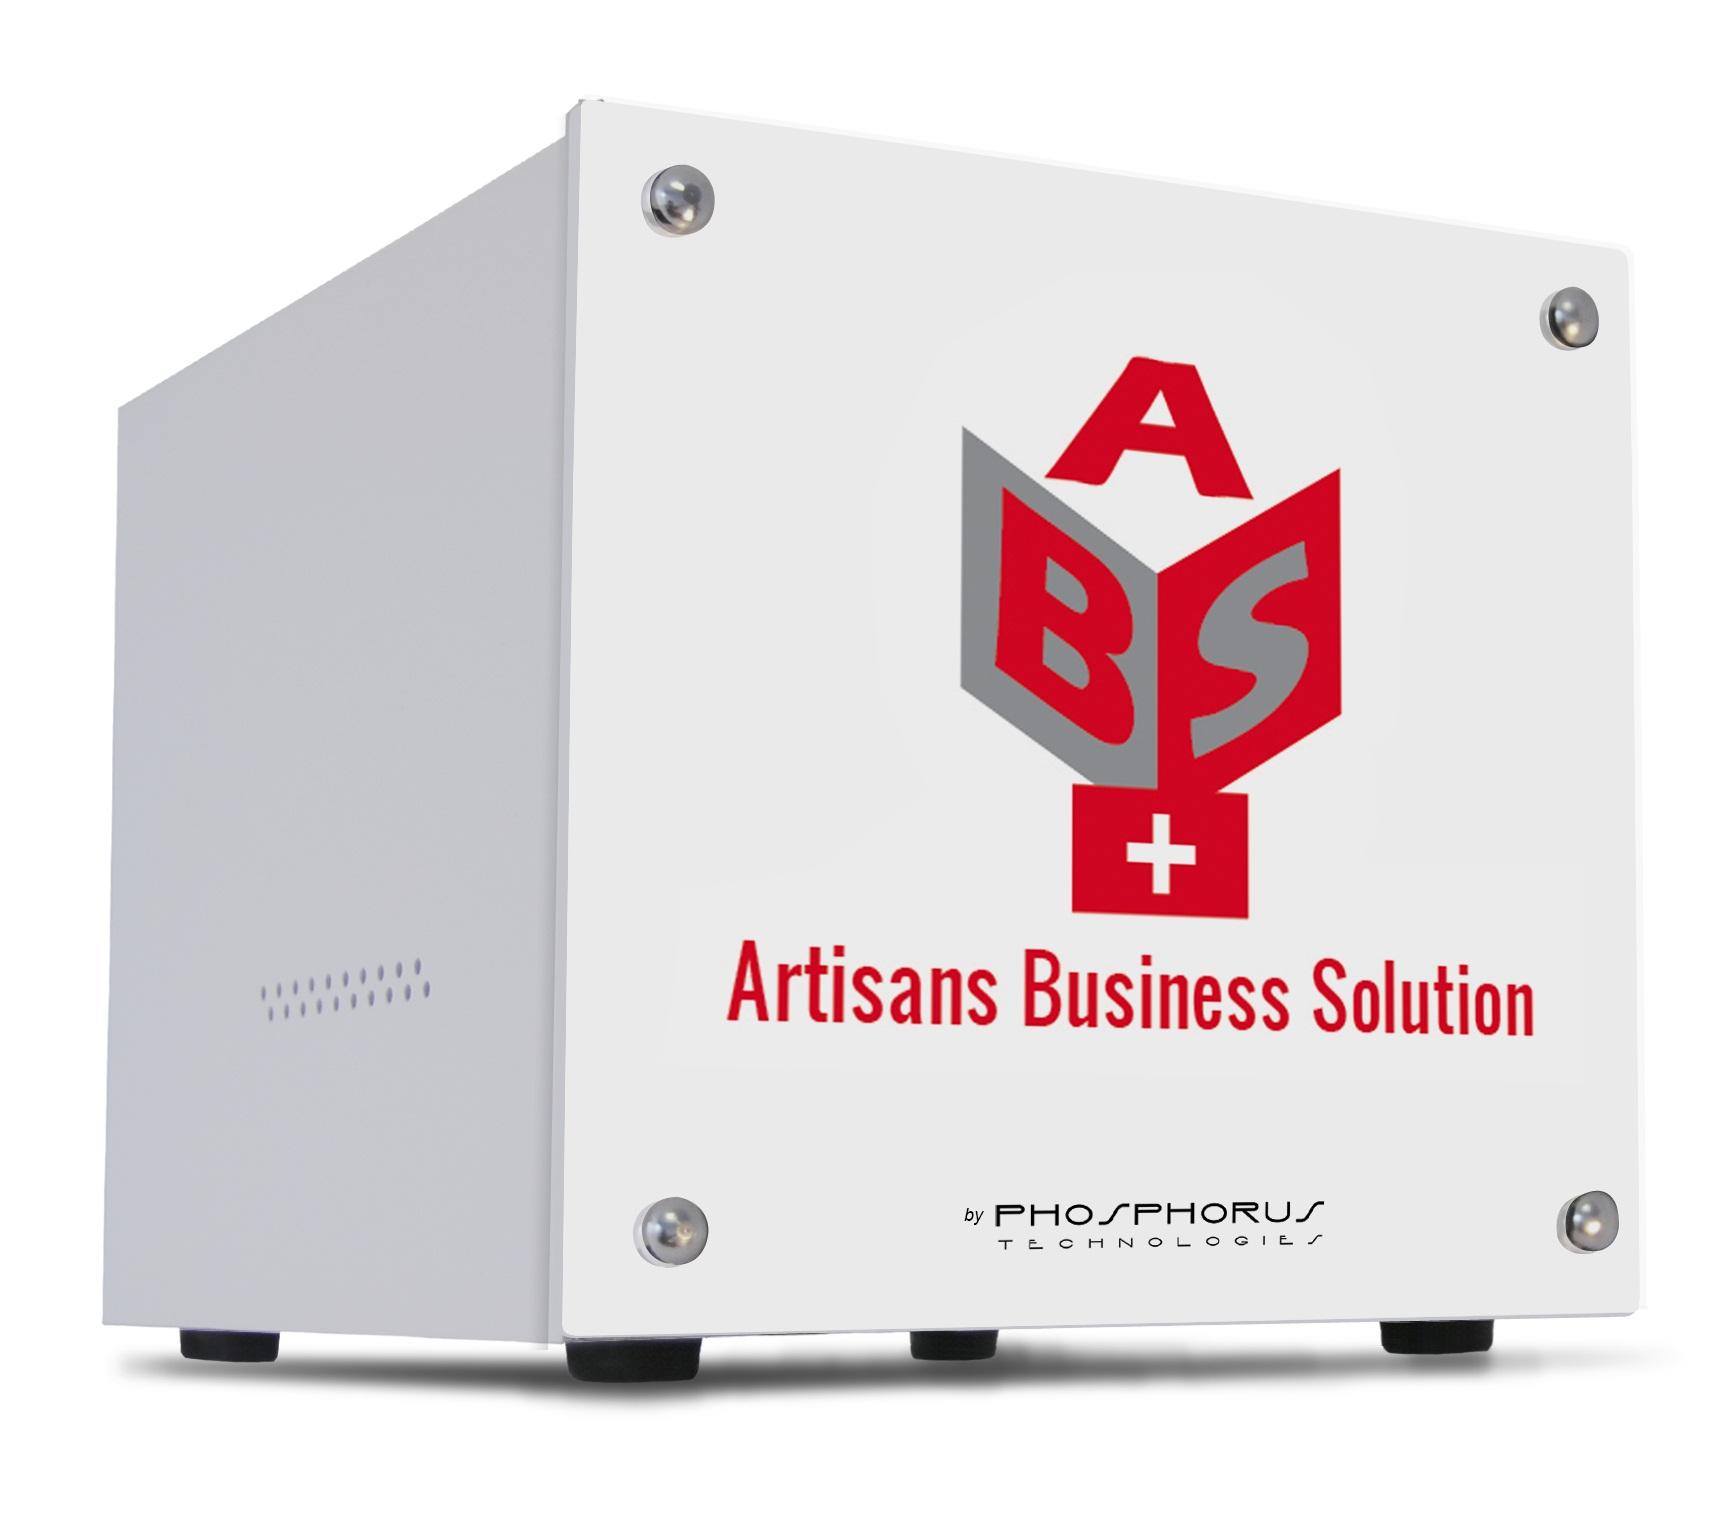 Box Artisans Business Solution